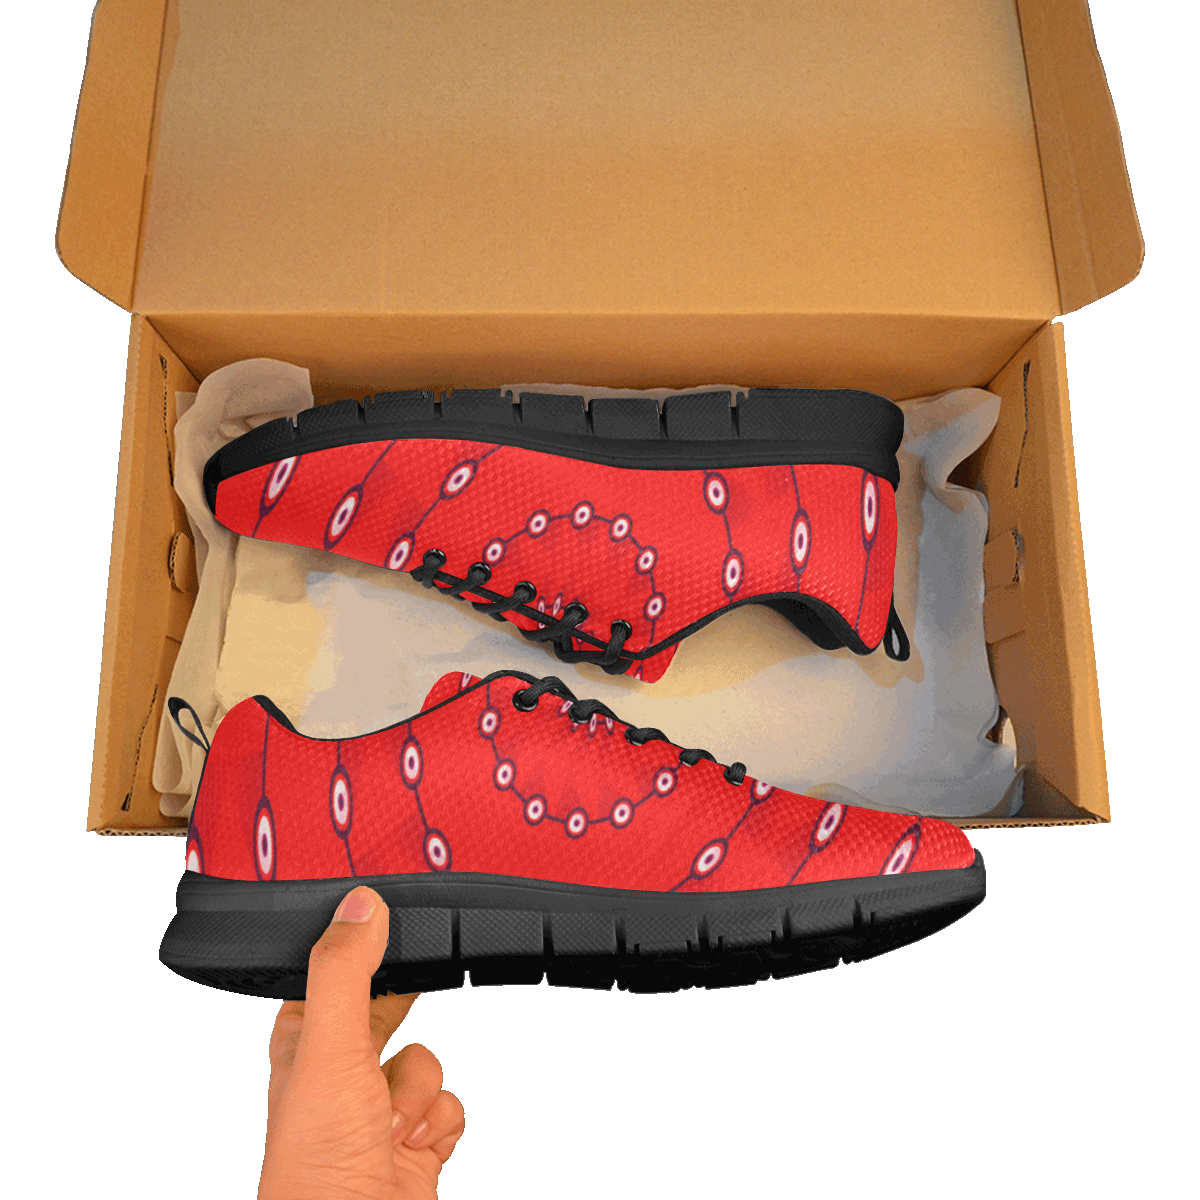 10000 art324 11 Men's Breathable Running Shoes/Large (Model 055)